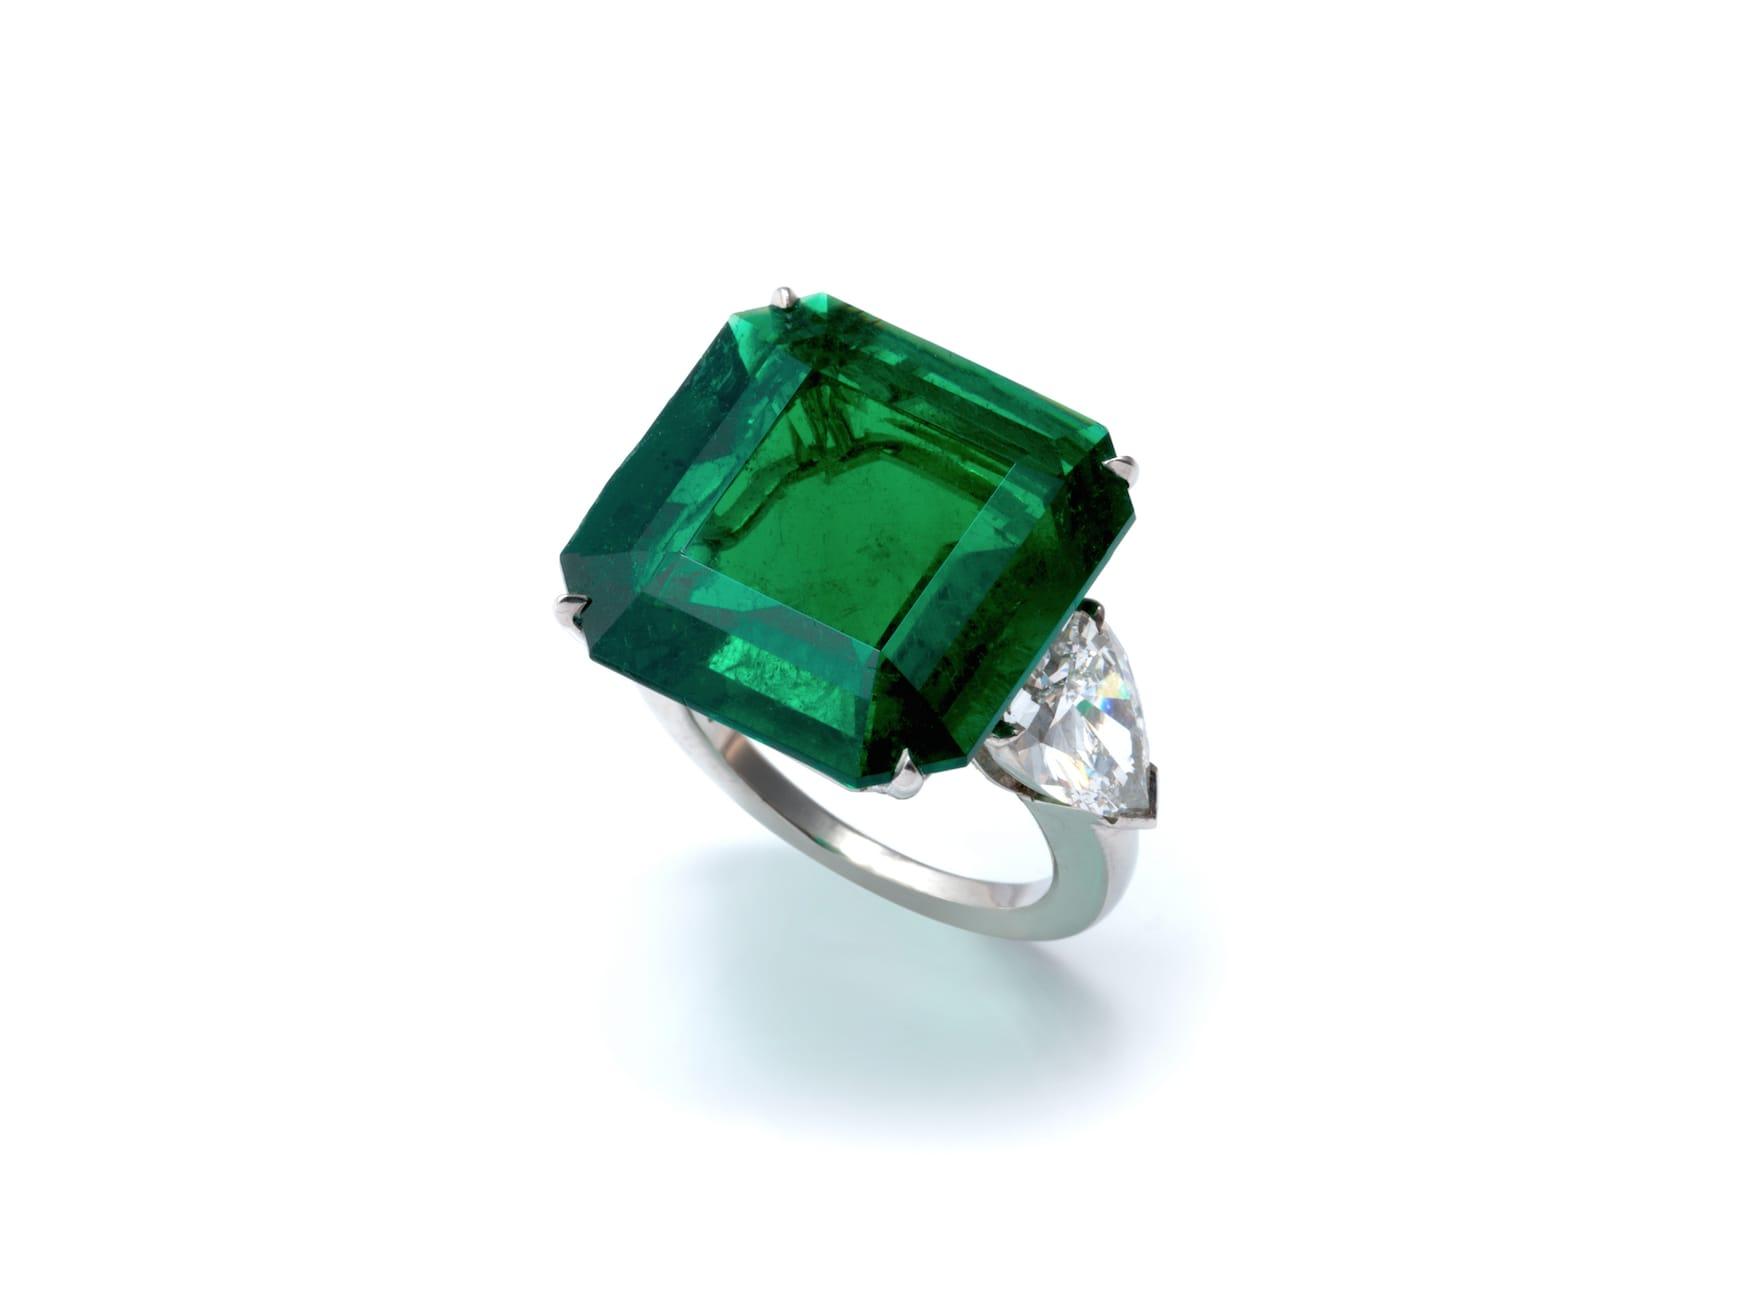 bayco-emerald-diamond-ring